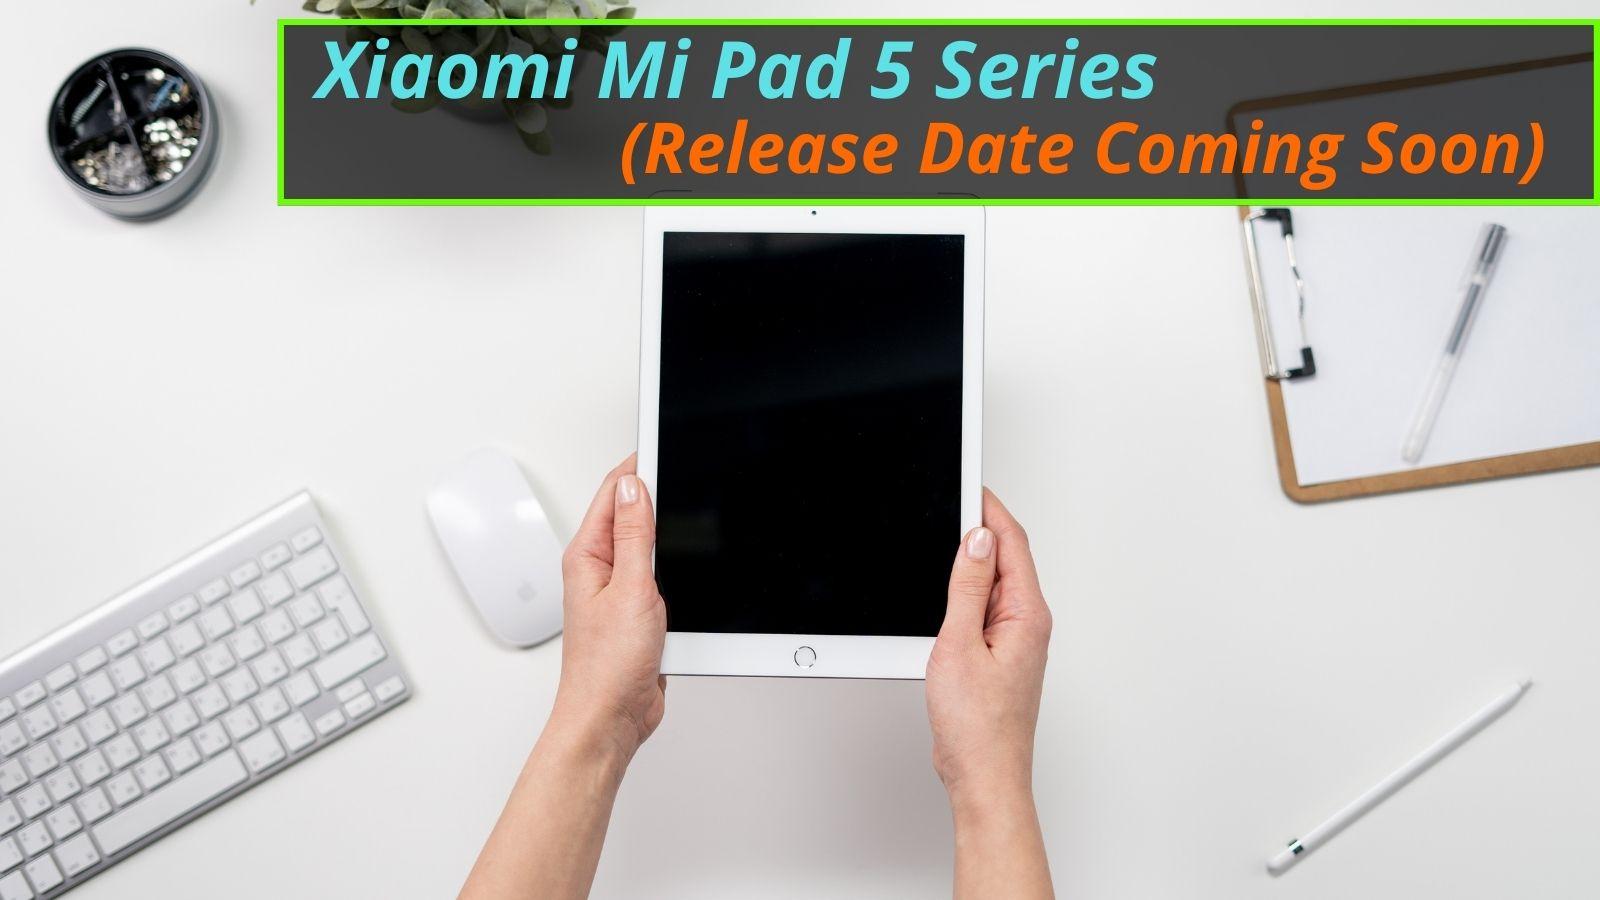 Xiaomi Mi Pad 5 Series Release Date Coming Soon